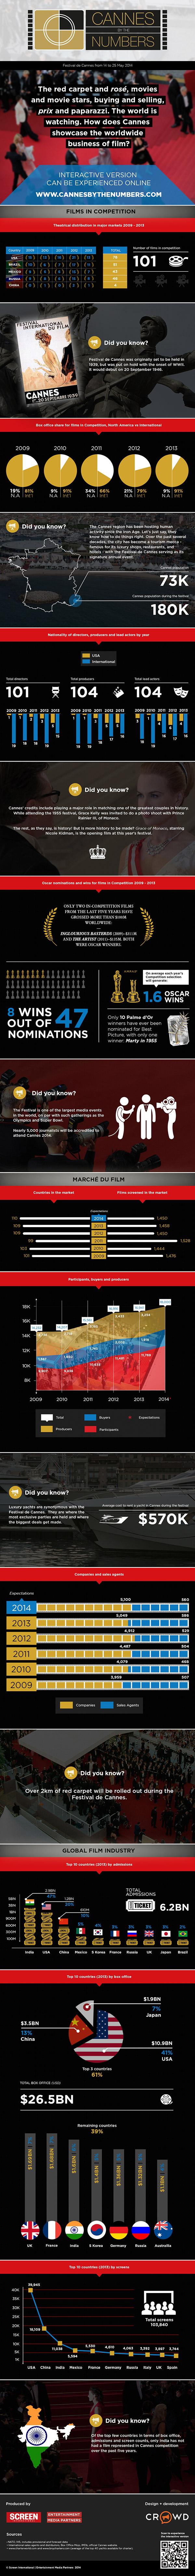 Infographic Static Web